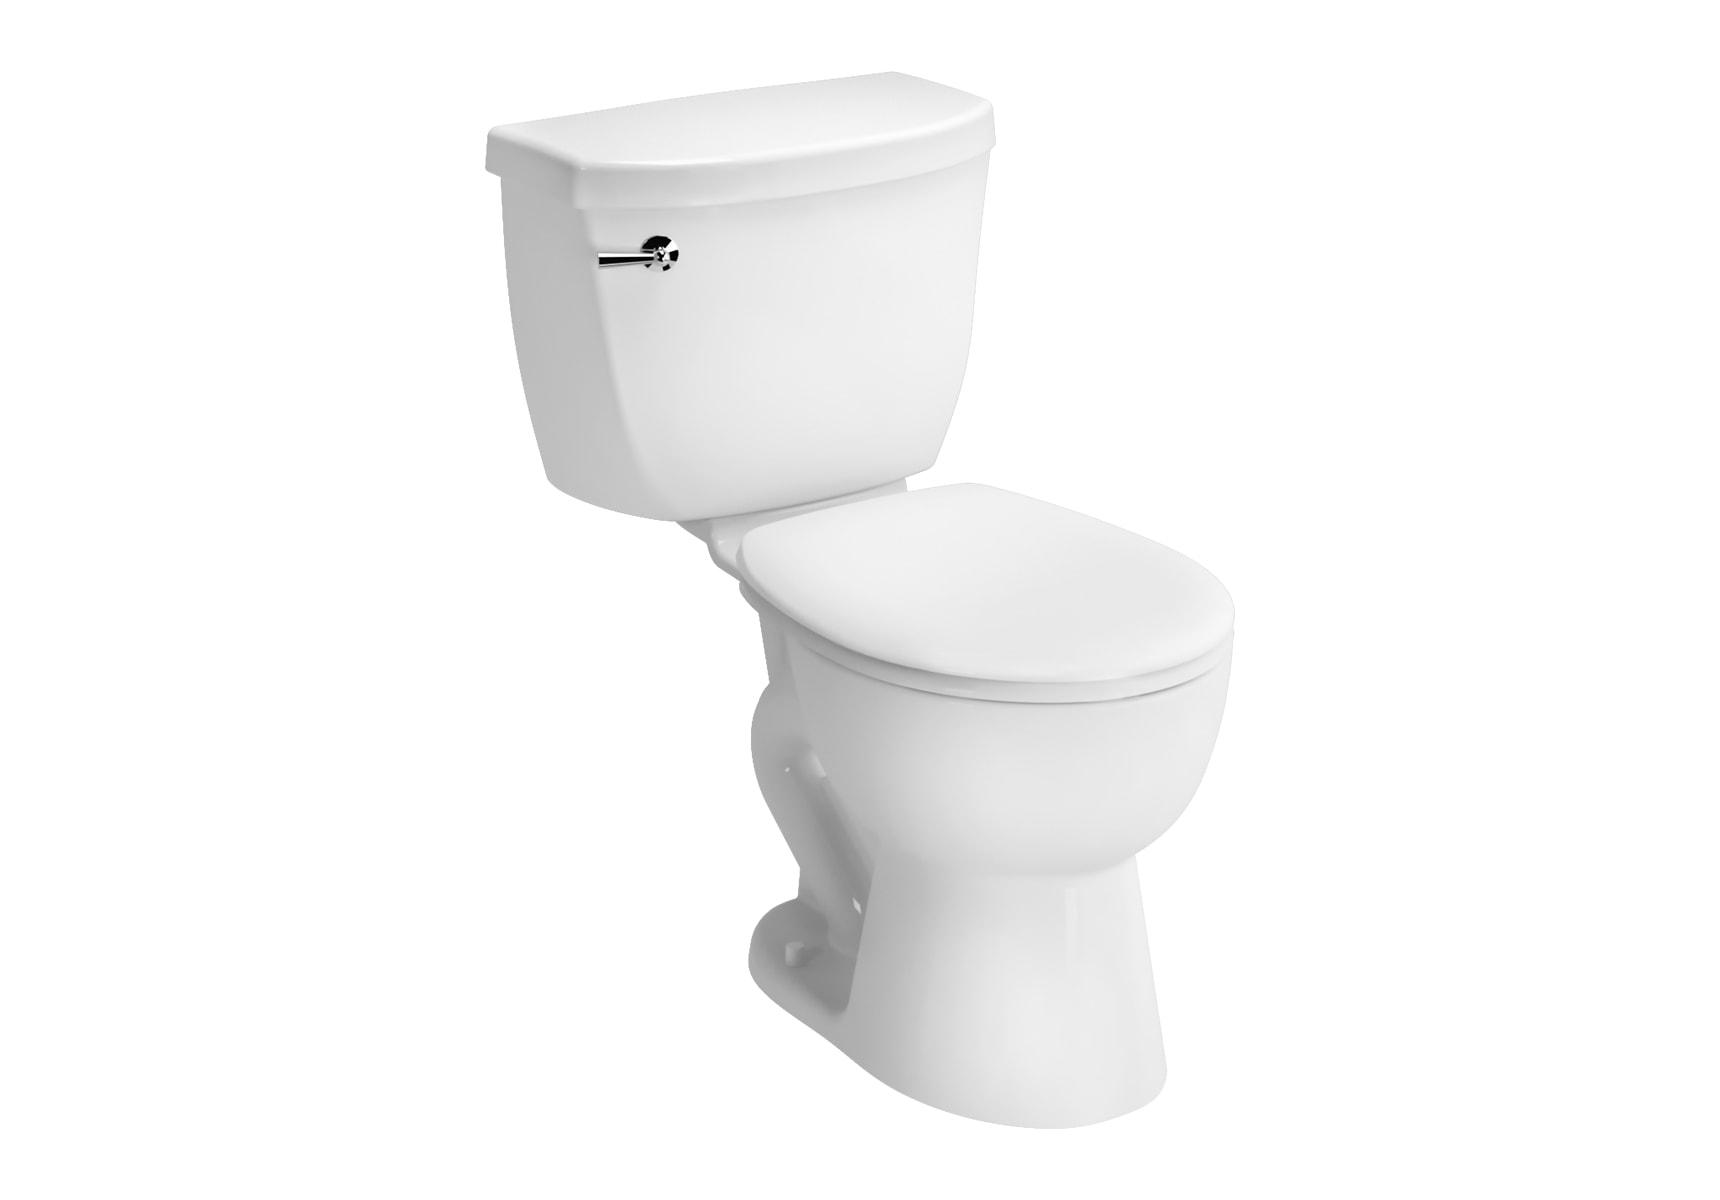 Arkitekt Evergreen Syphonic WC Pan, Round